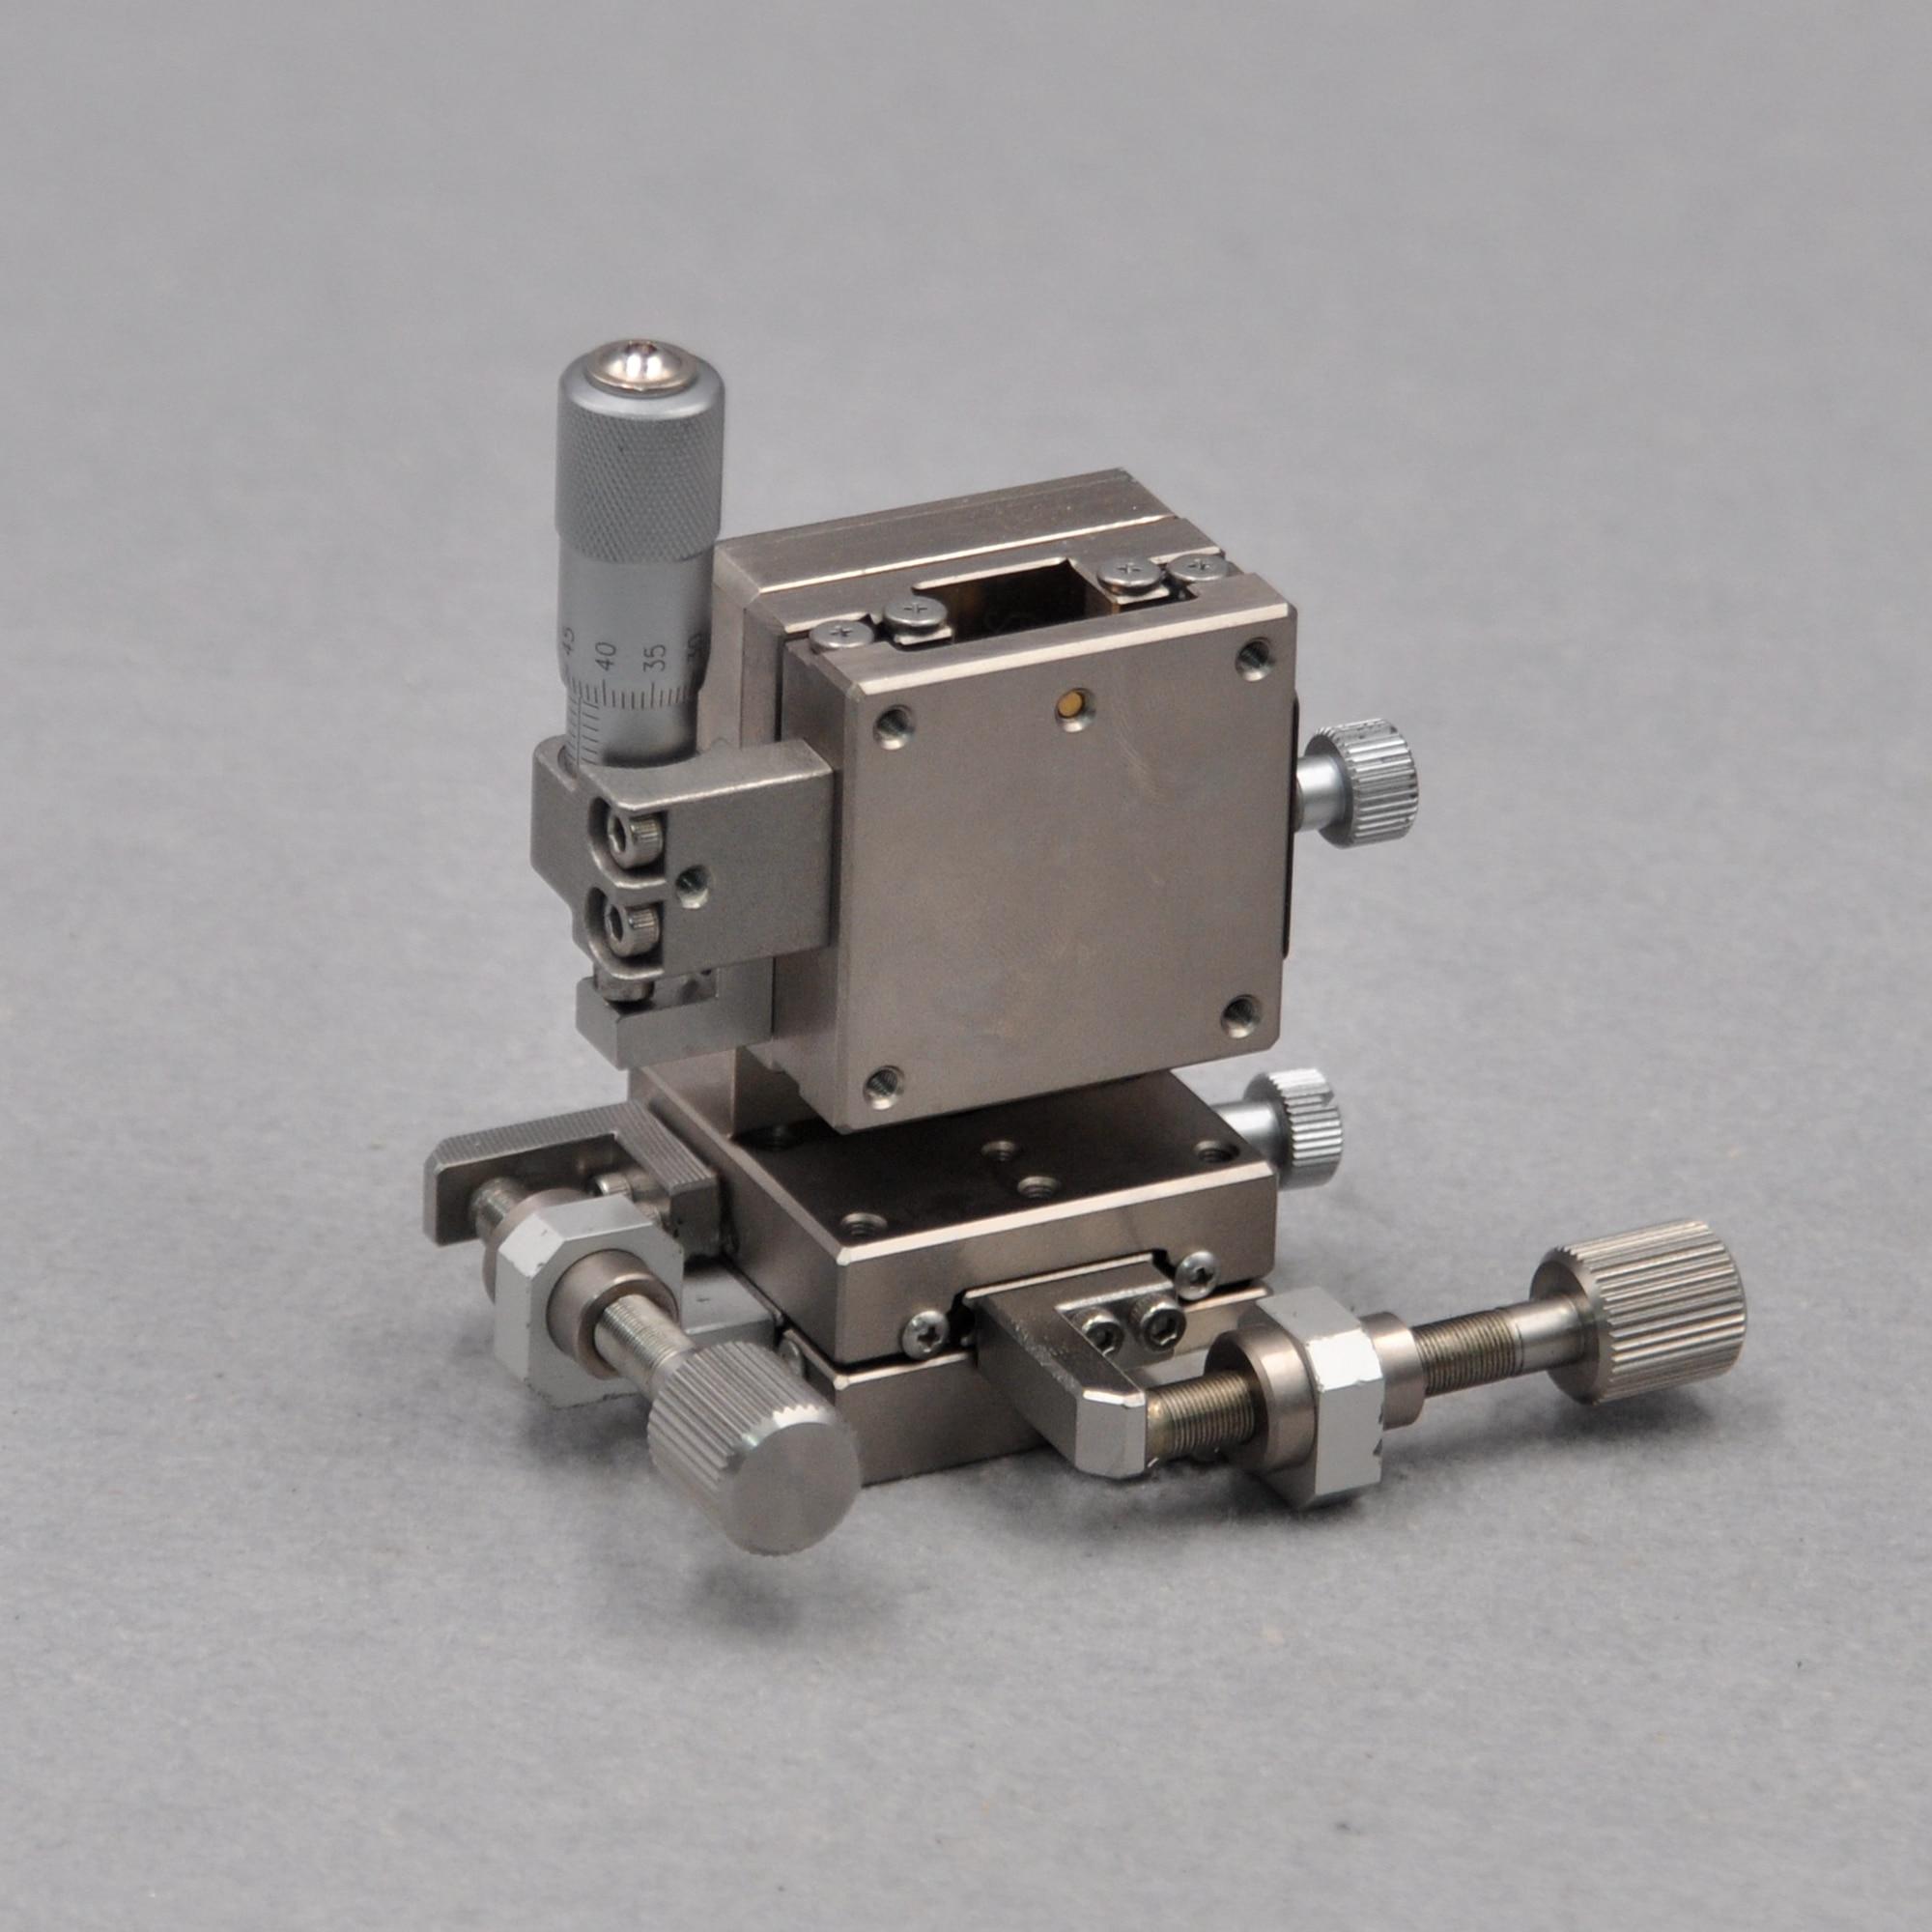 SURUGA SEIKI XYZ axis three-dimensional BXT04013-CL BSS23-40C1 optical manual high precision displacement fine-tuning slide